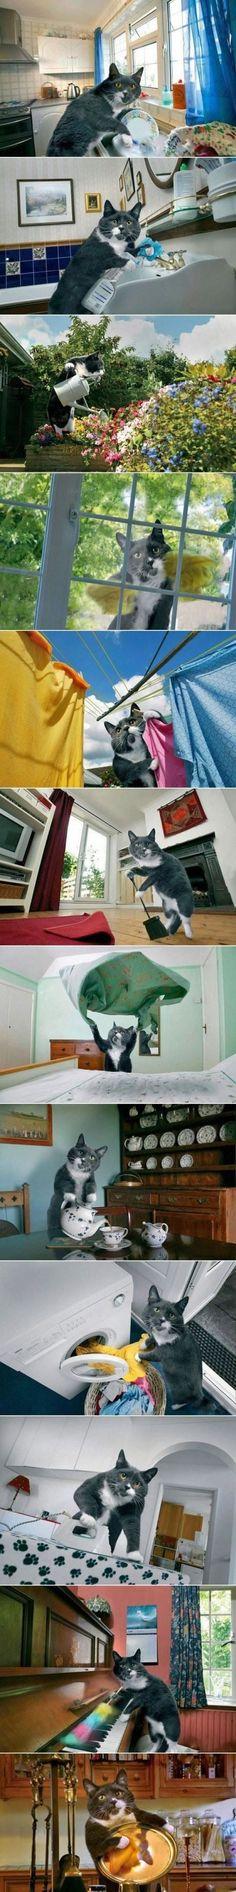 I need this cat :p